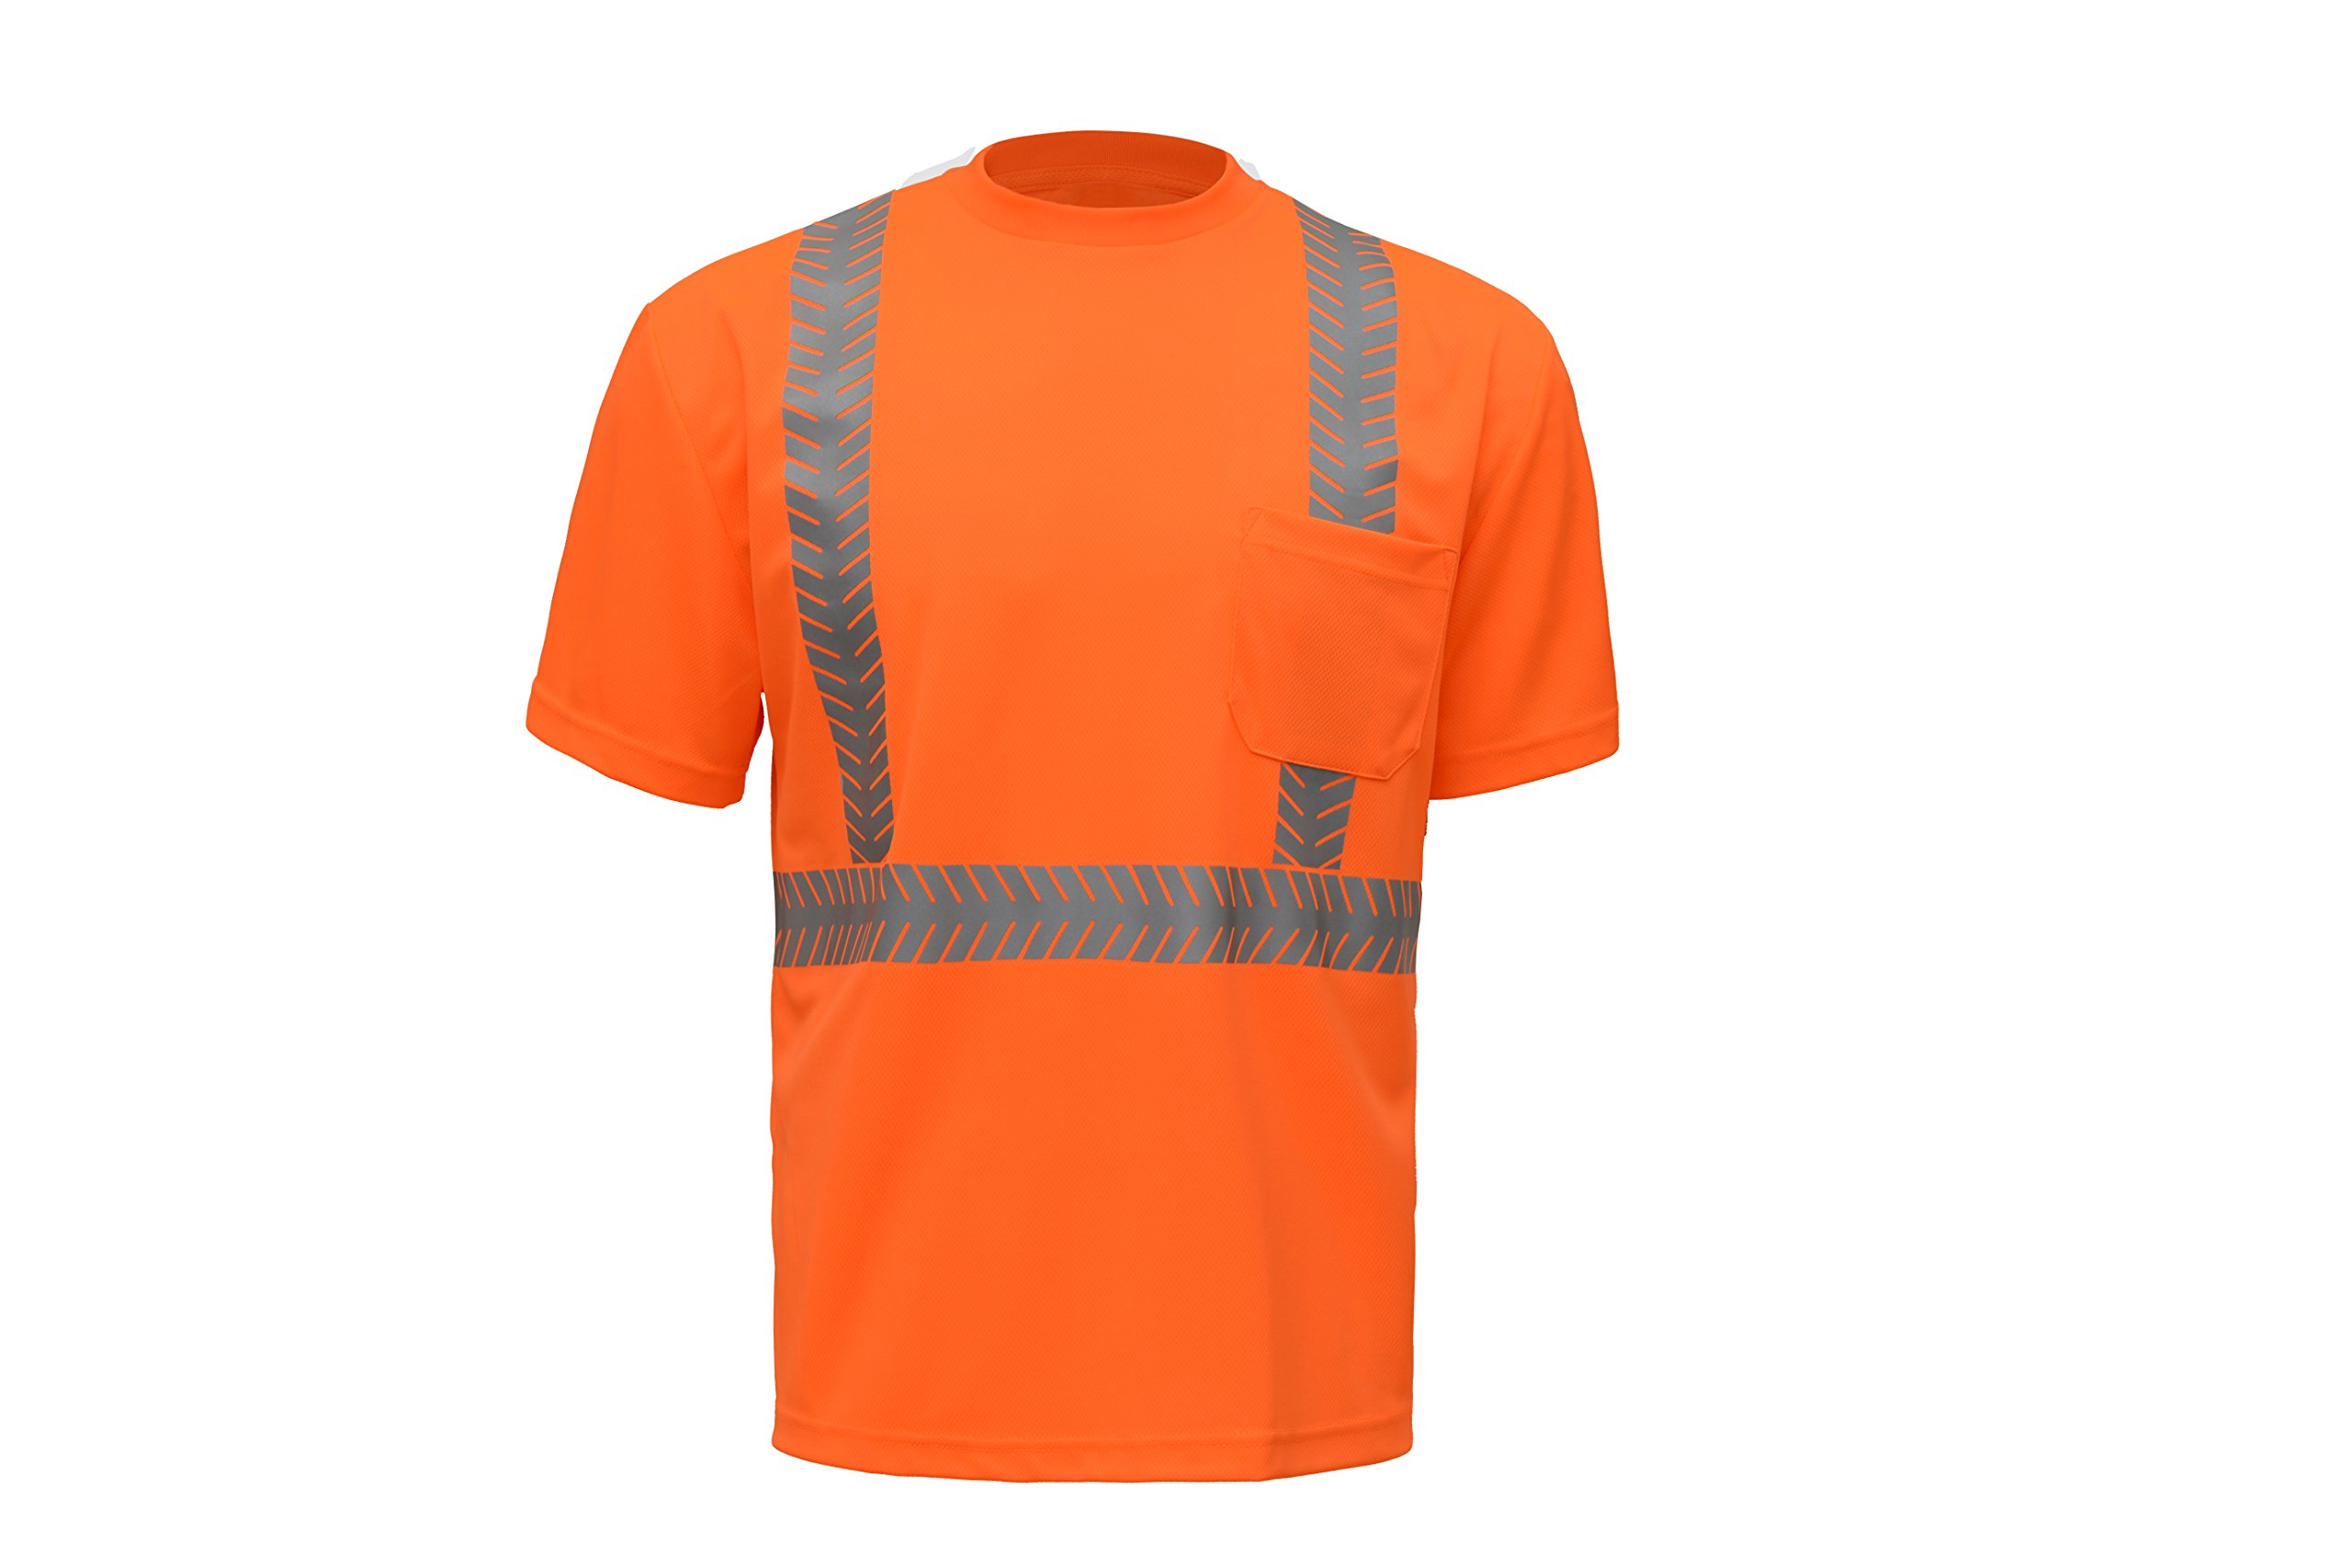 CJ Safety CJHVTS2002 ANSI Class 2 High Vis Short Sleeve Safety Shirt | Moisture Wicking Mesh, Segmented Reflective Tapes (Large, Orange)